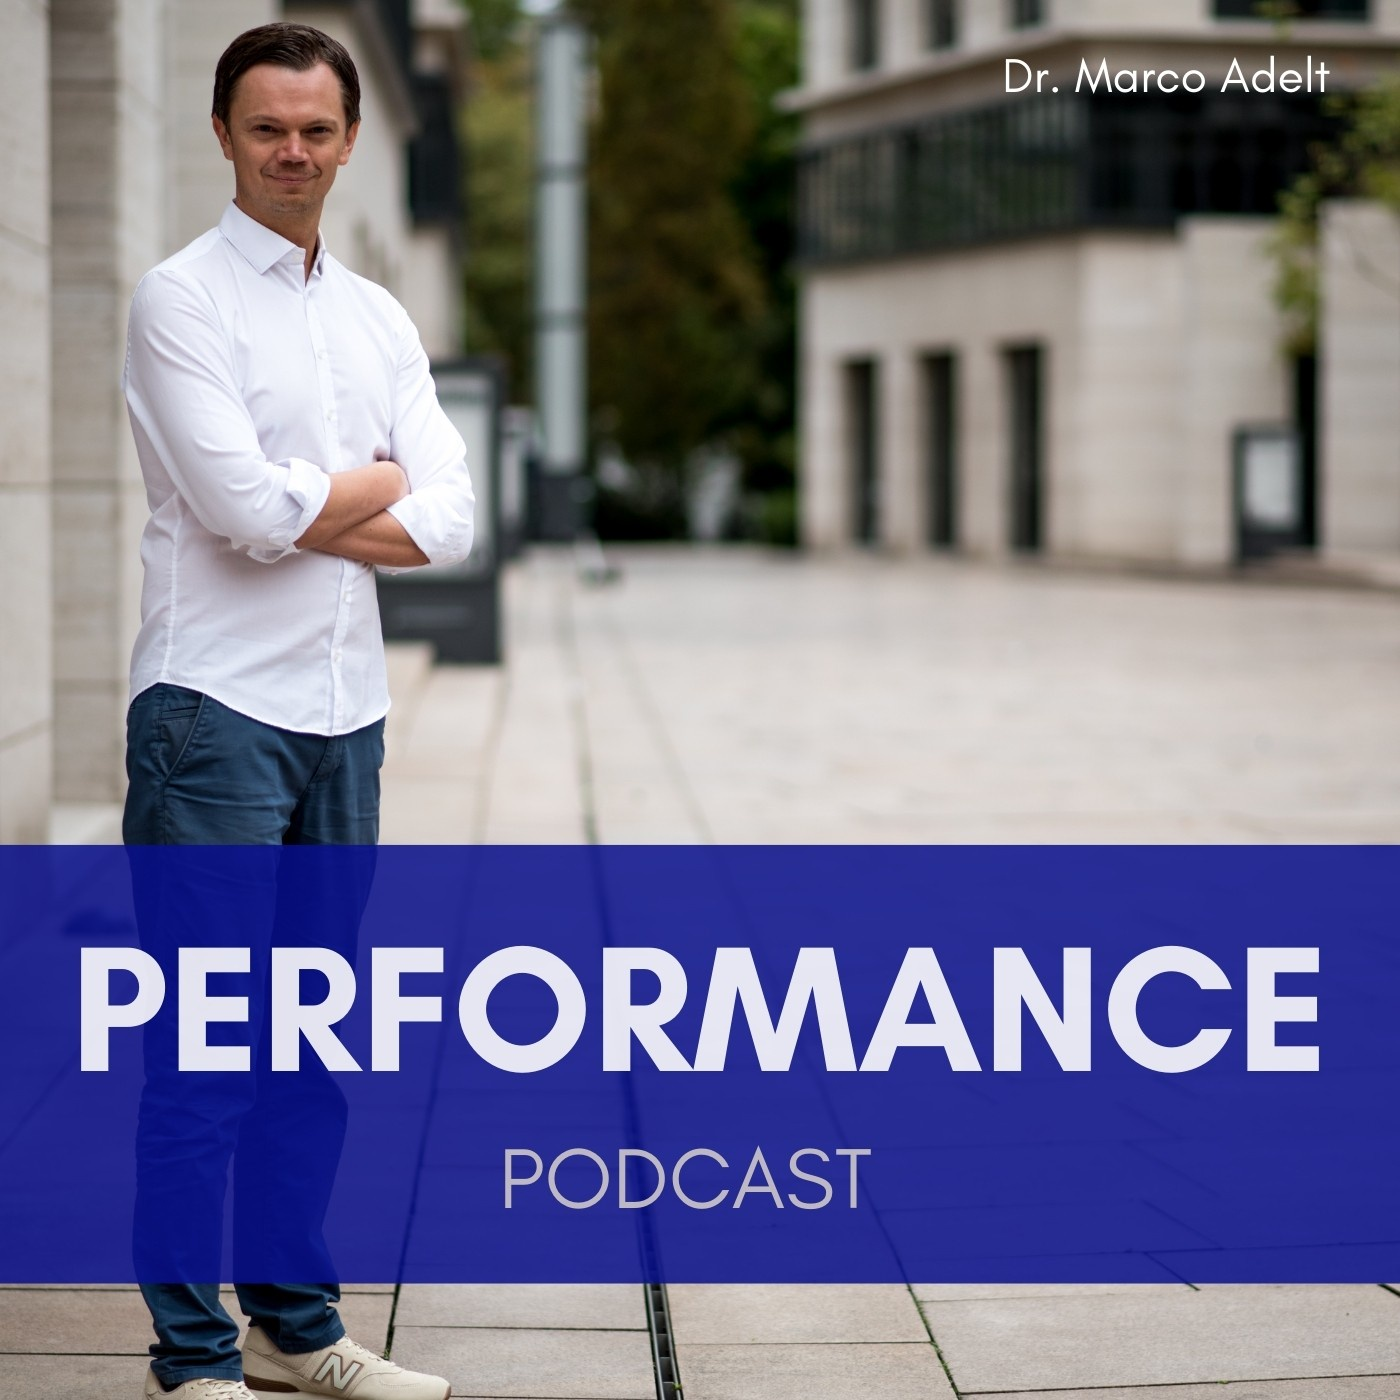 Performance Podcast